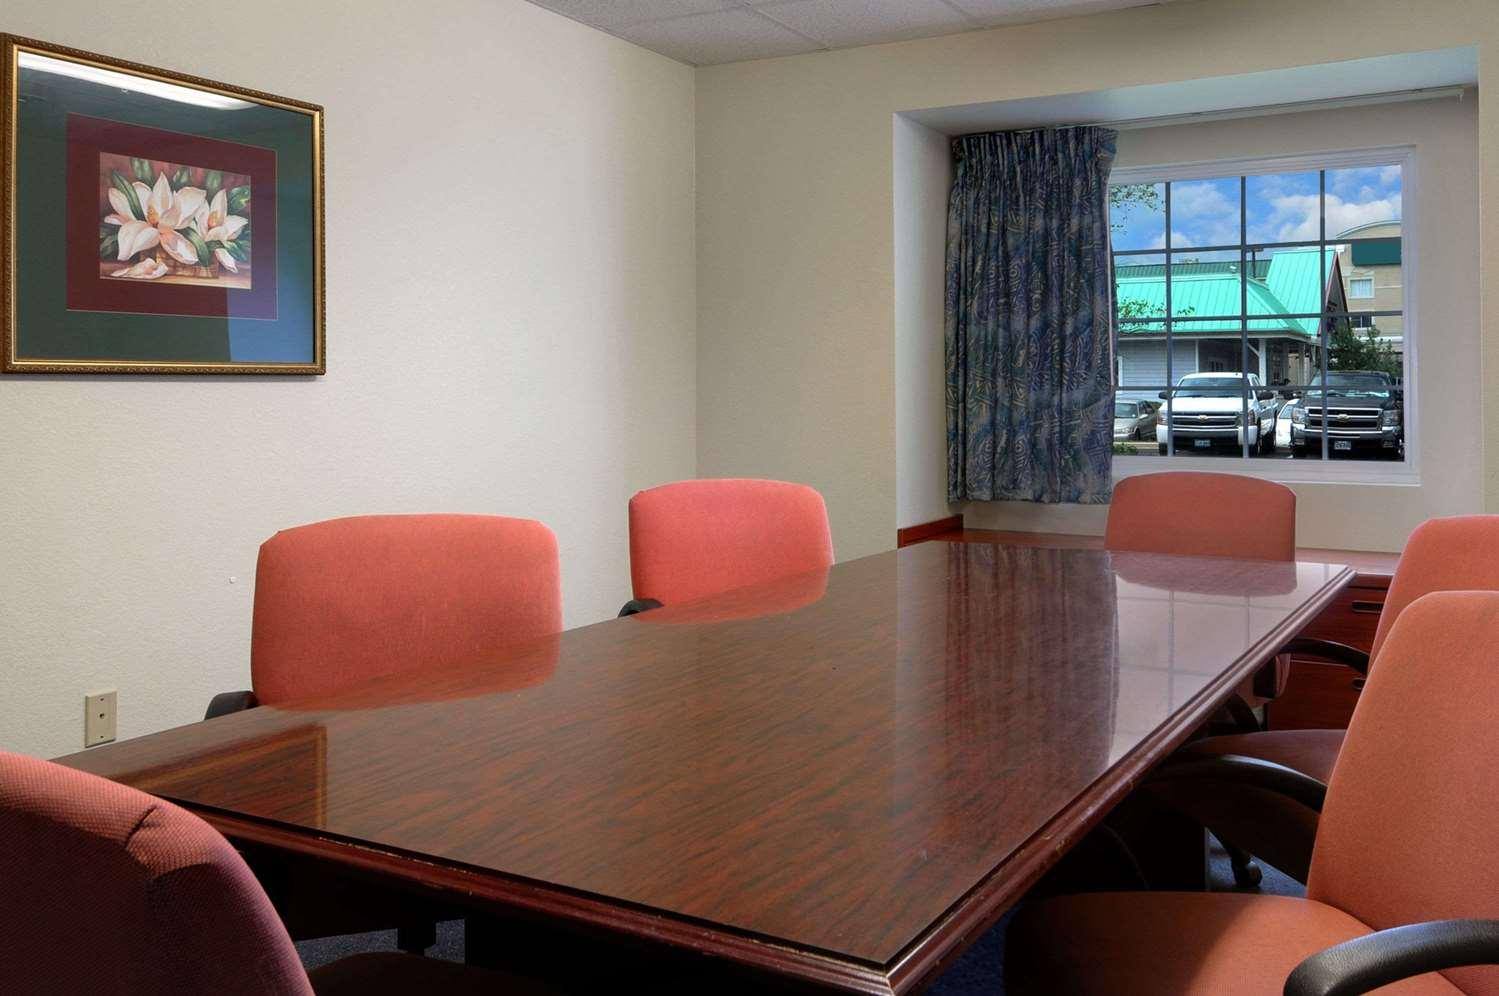 Meeting Facilities - Microtel Inn & Suites by Wyndham Bossier City